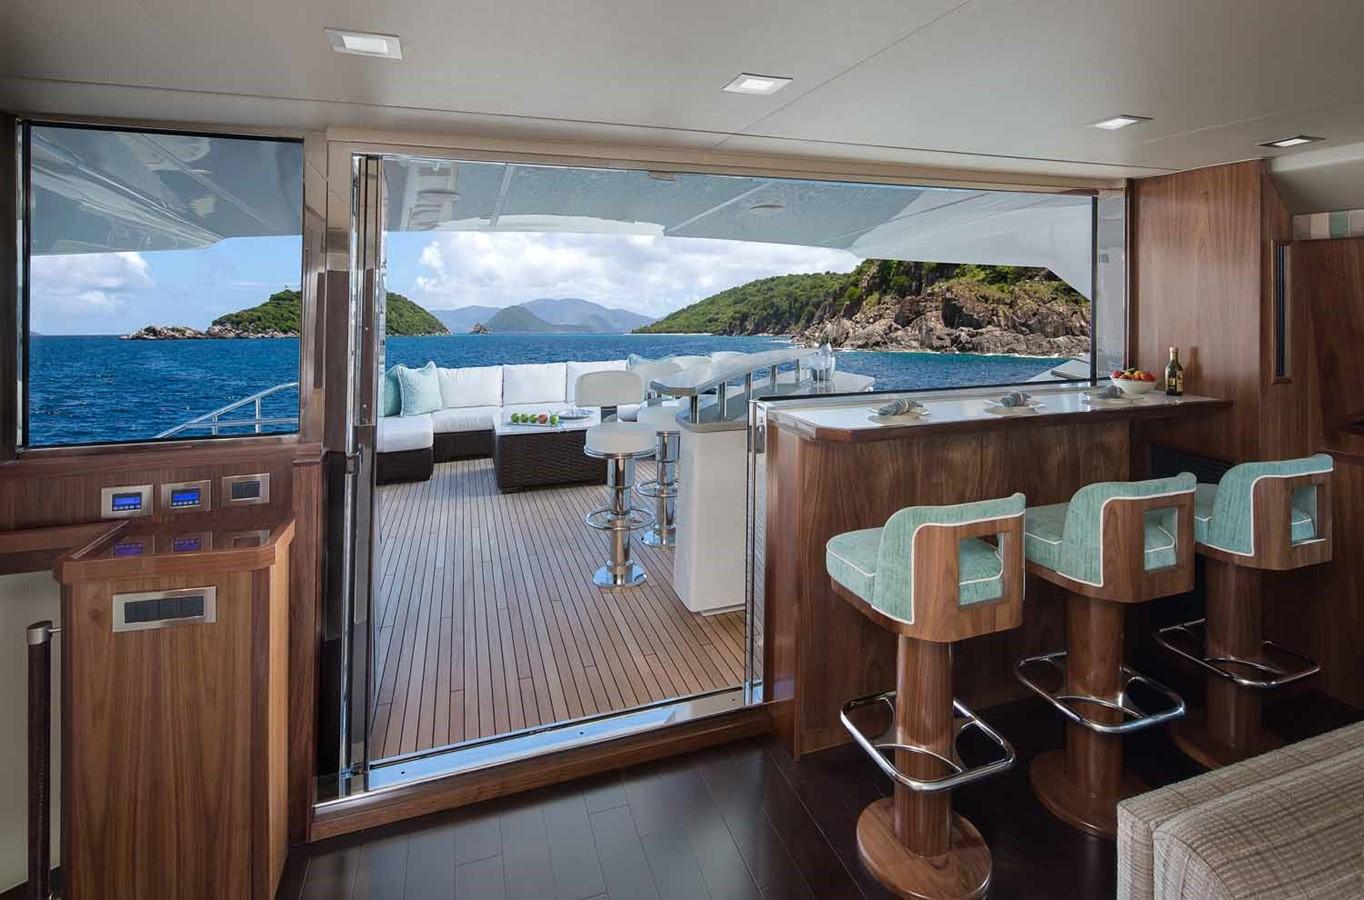 2019 VIKING Enclosed Bridge Motor Yacht 2463998